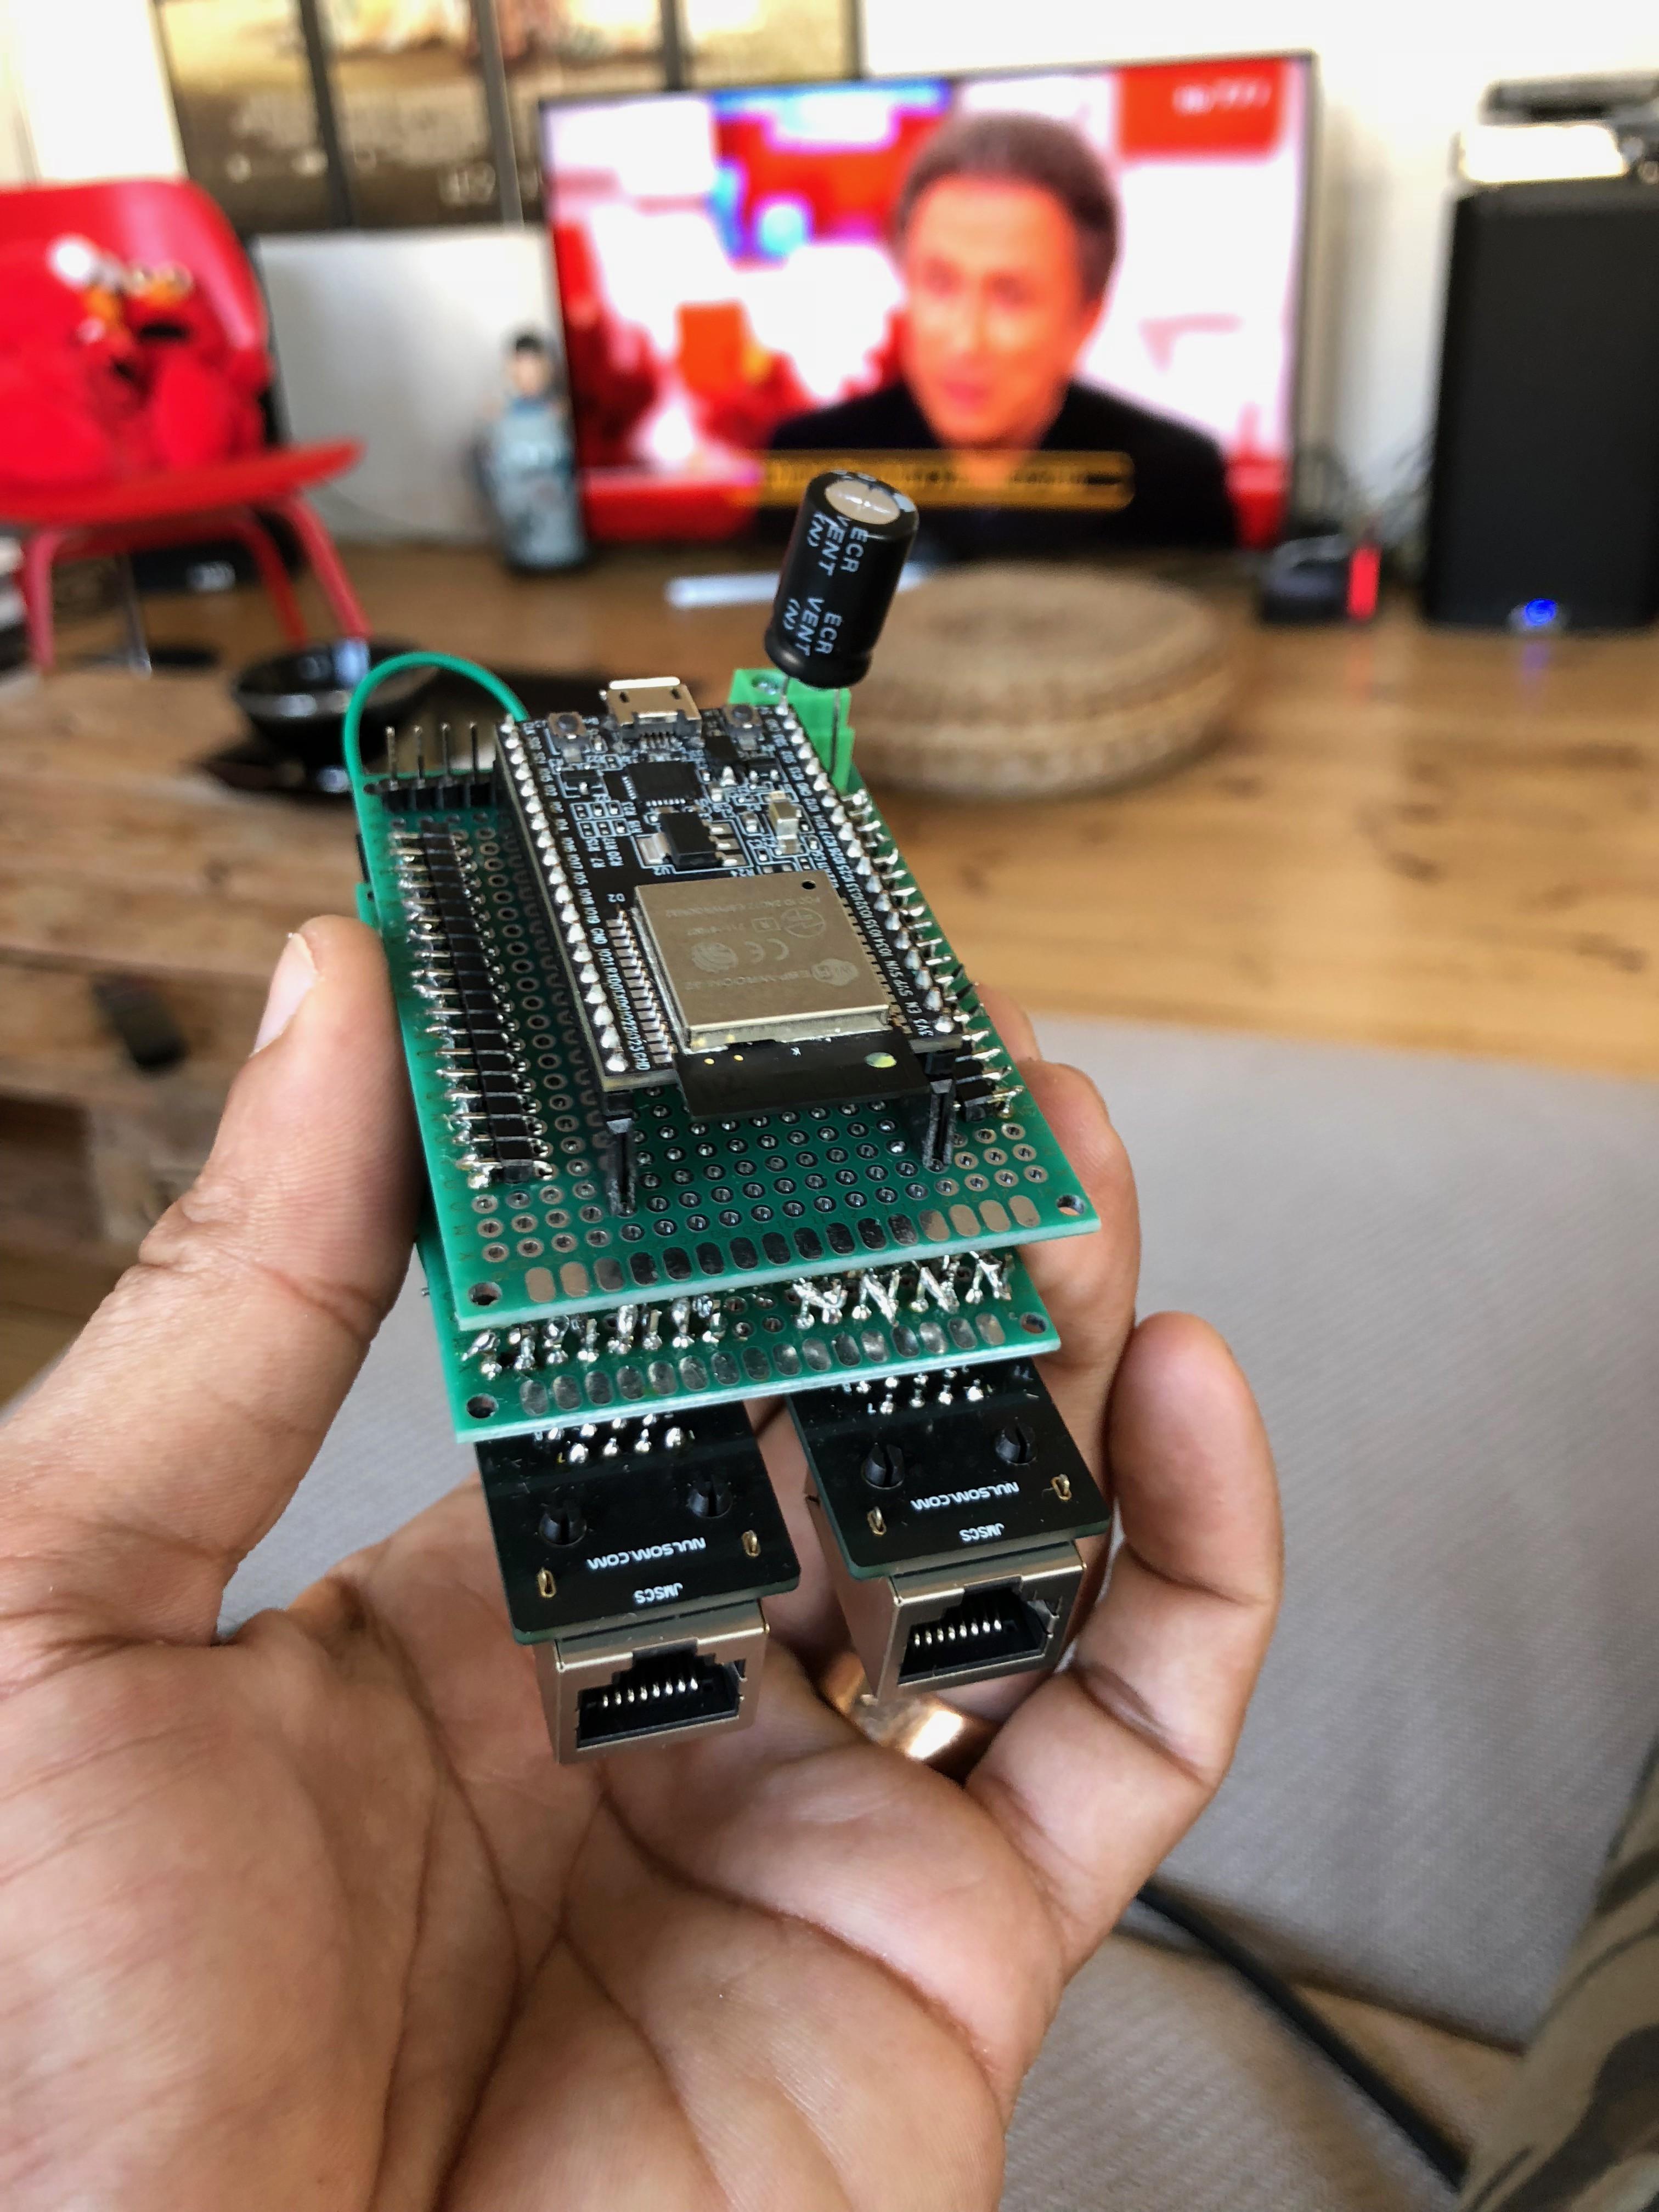 5904 leds panel | Details | Hackaday io